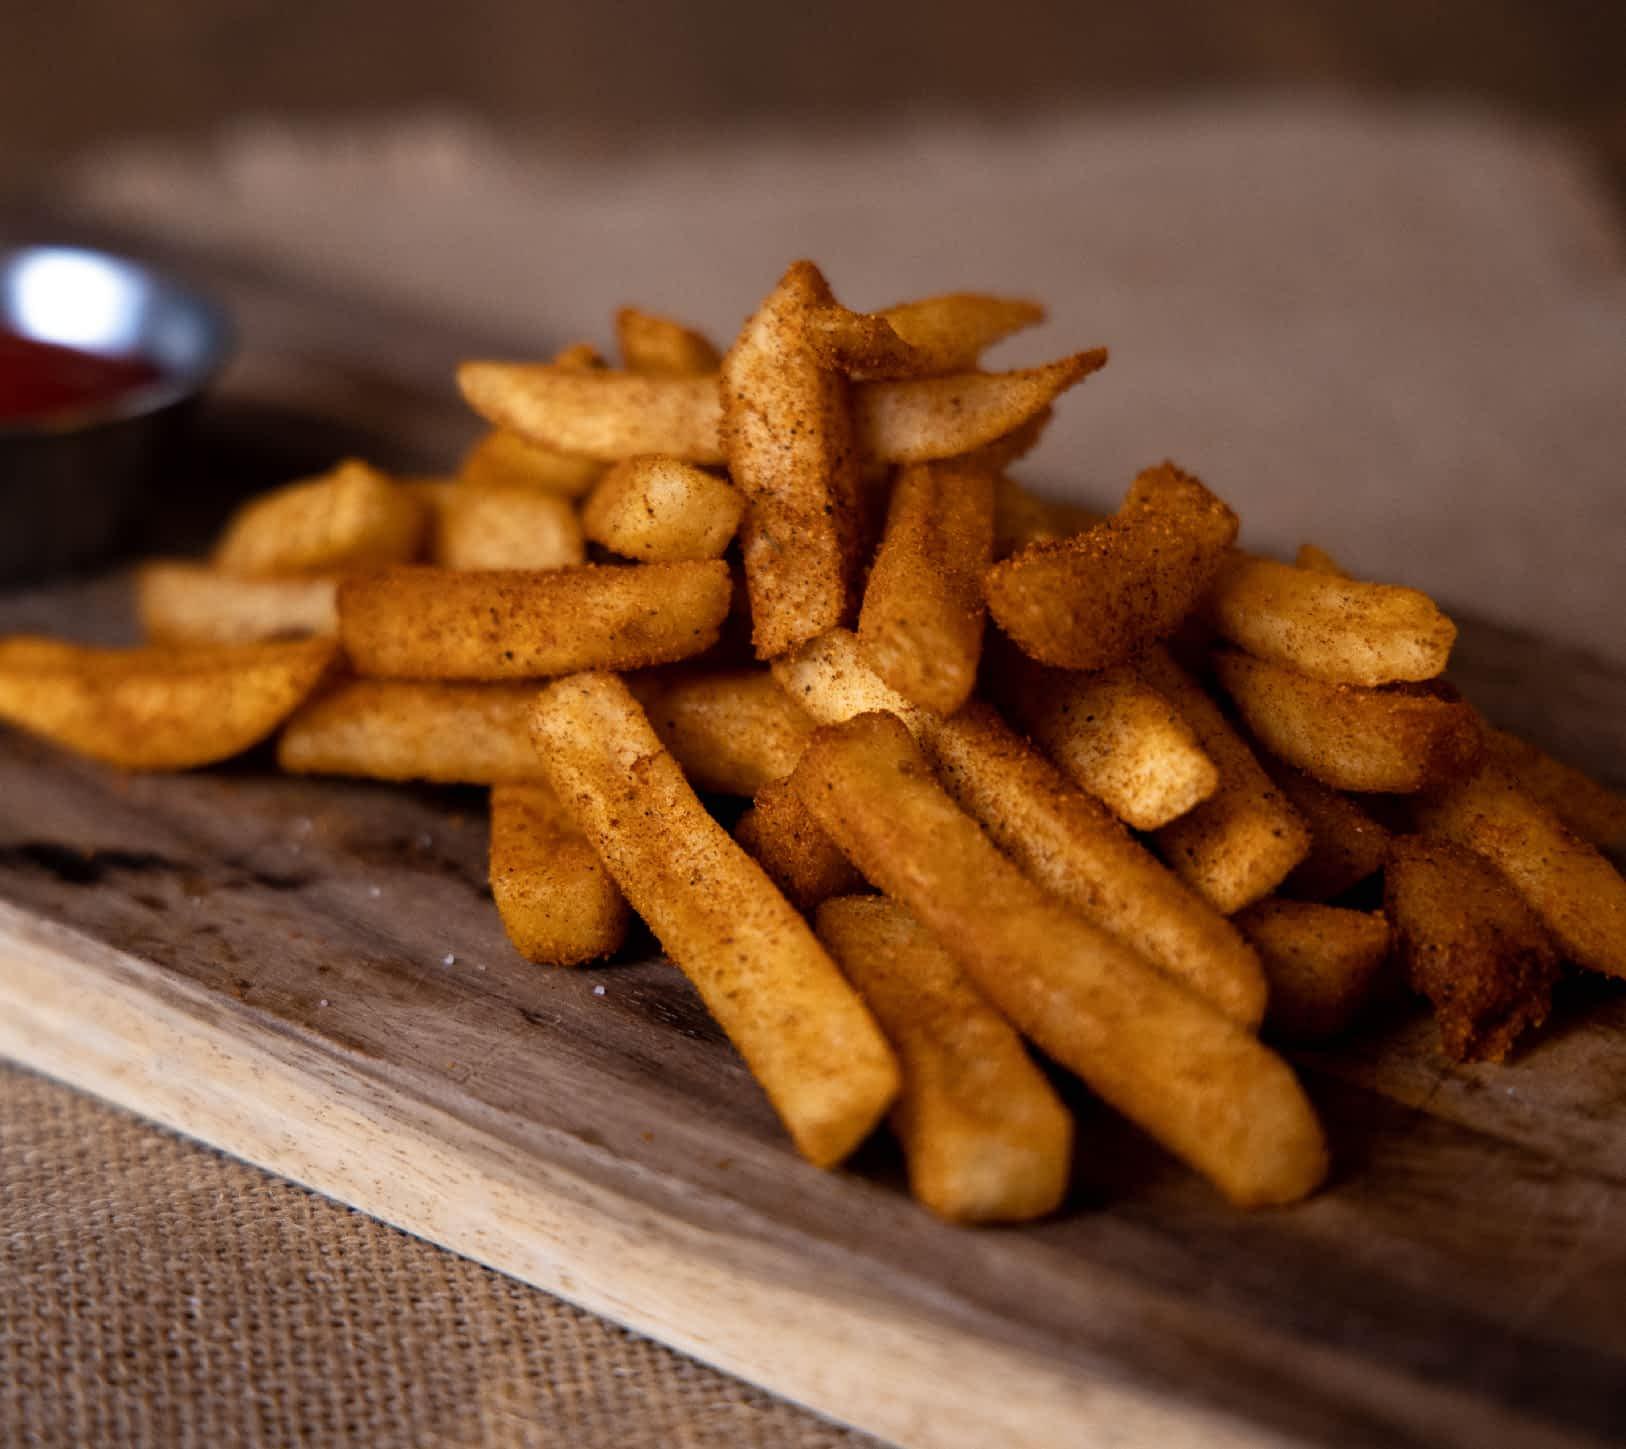 OISO-_MENU_Side French Fries Cajun